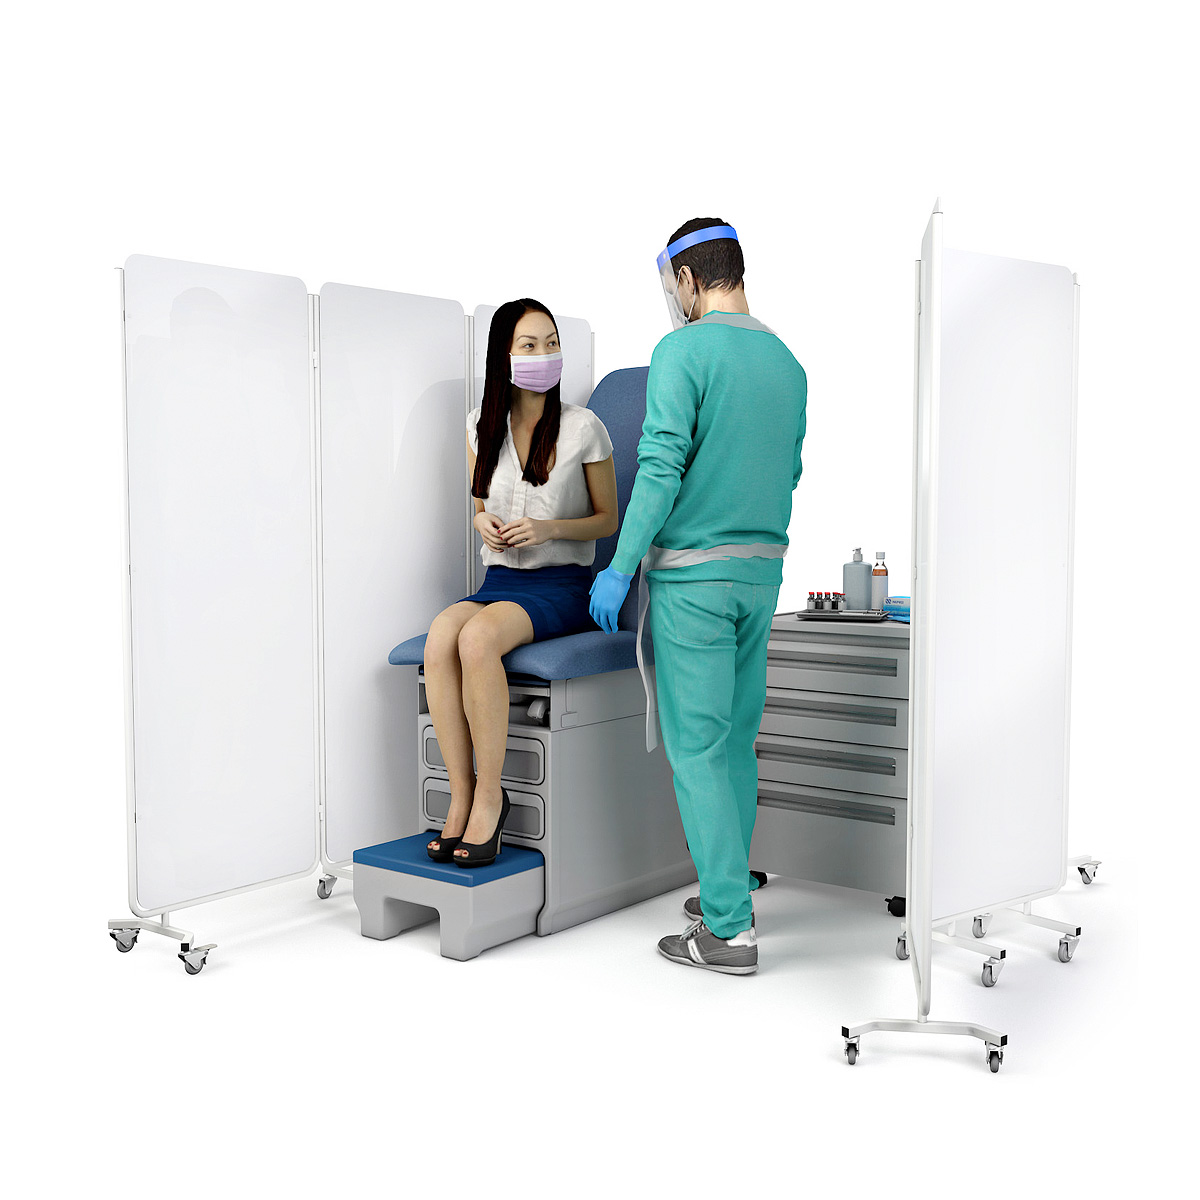 DIGNITY® PLUS Mobile Hospital Medical Screens